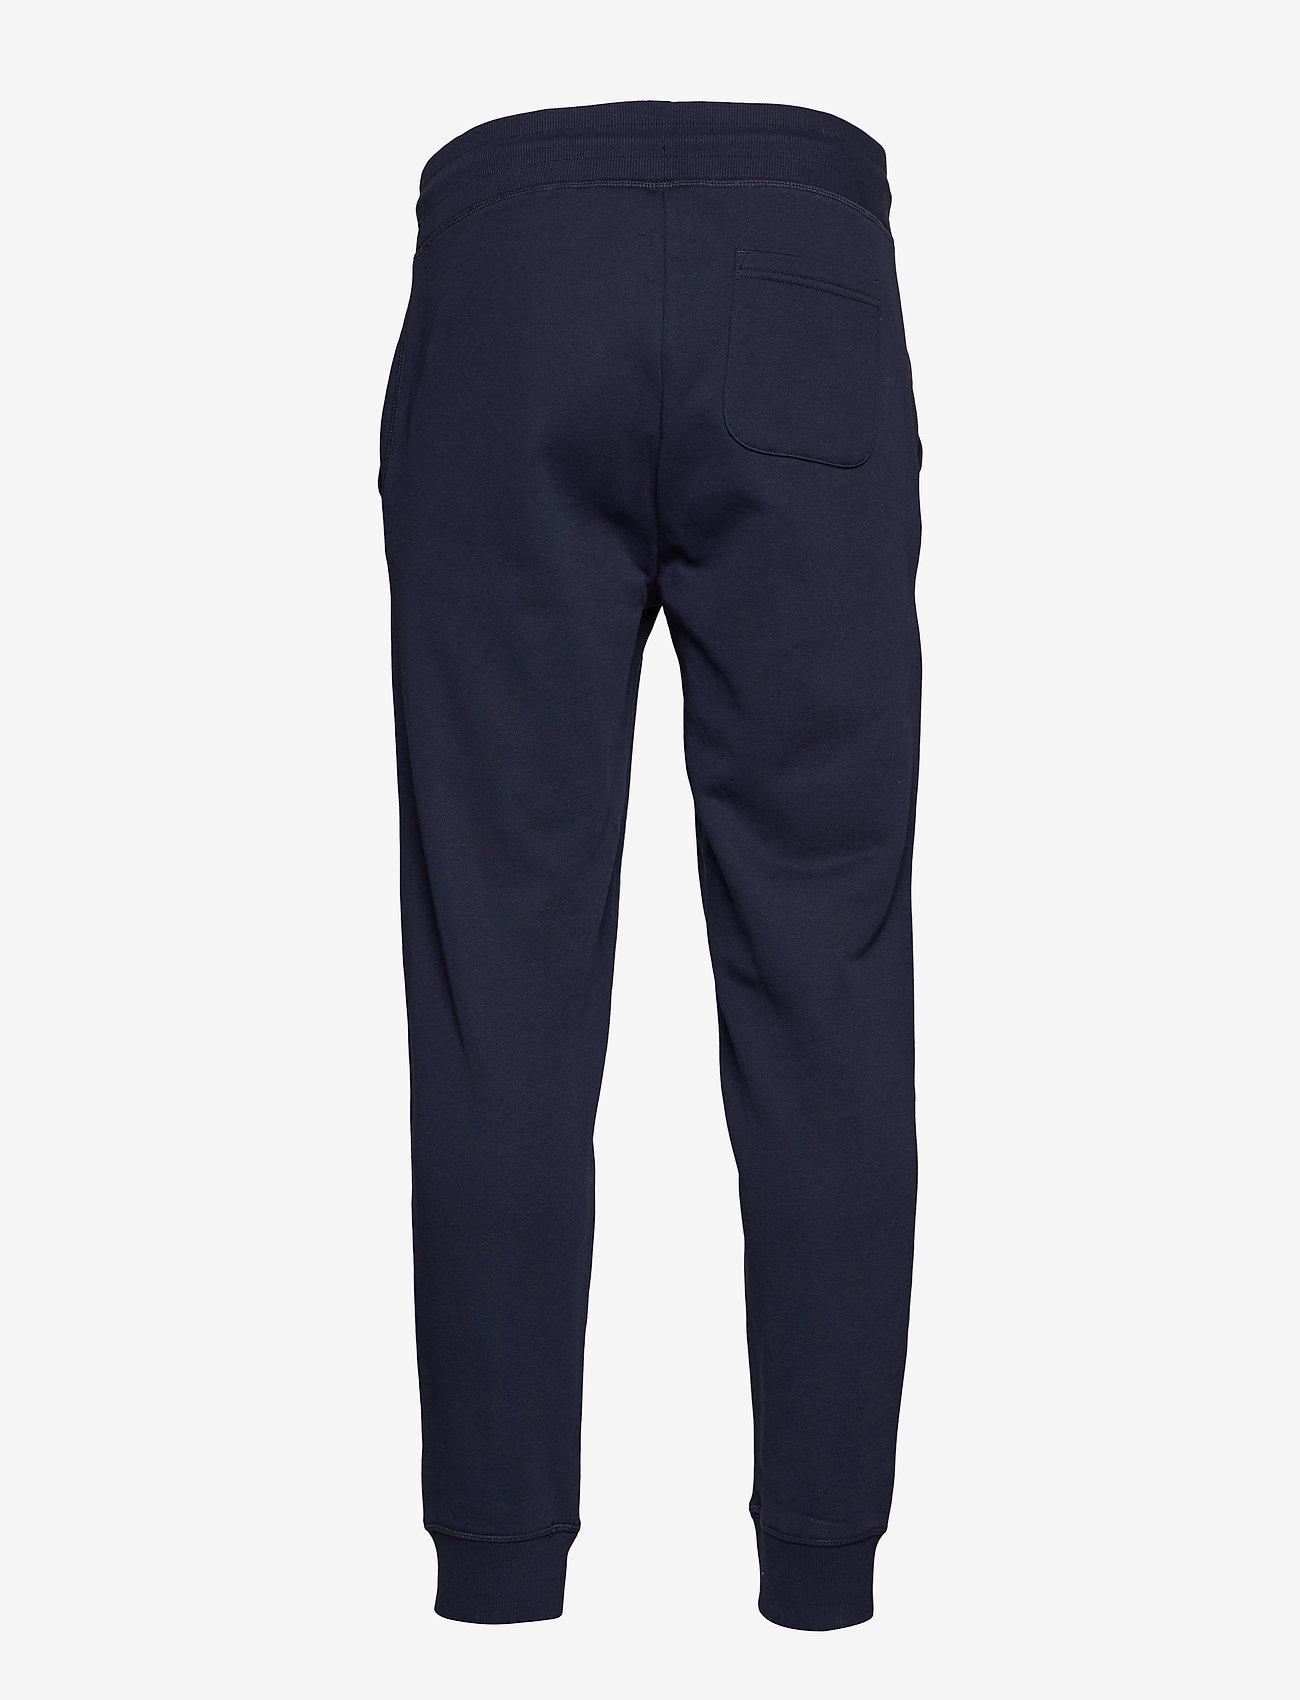 GANT THE ORIGINAL SWEAT PANTS - Joggebukser EVENING BLUE - Menn Klær